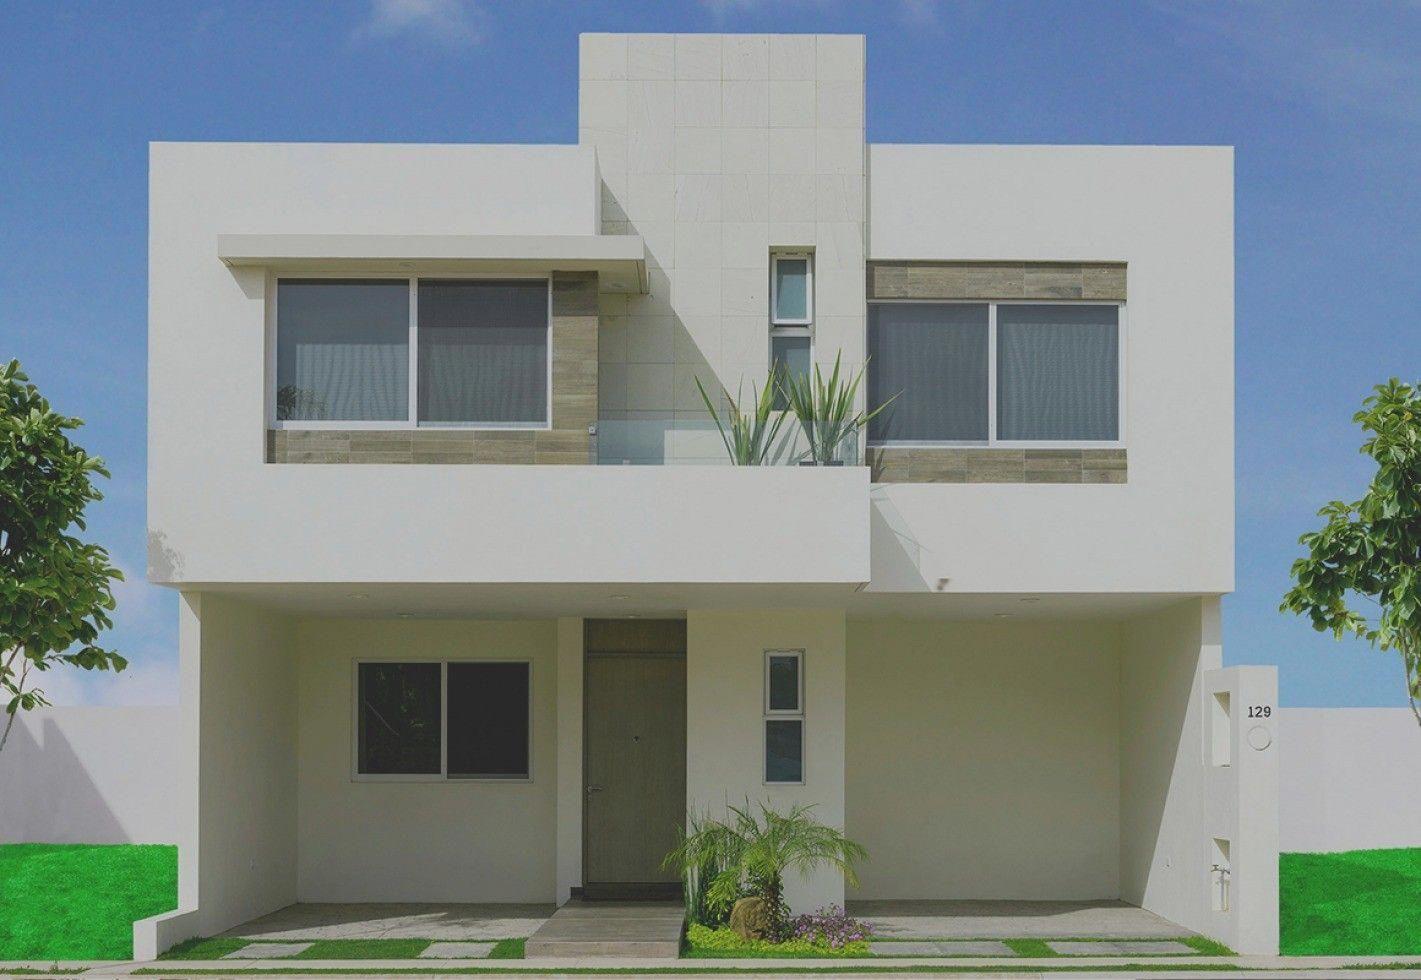 Full Size Of Fotos Fachadas Casas Dos Pisos Sencillas Estilos Un